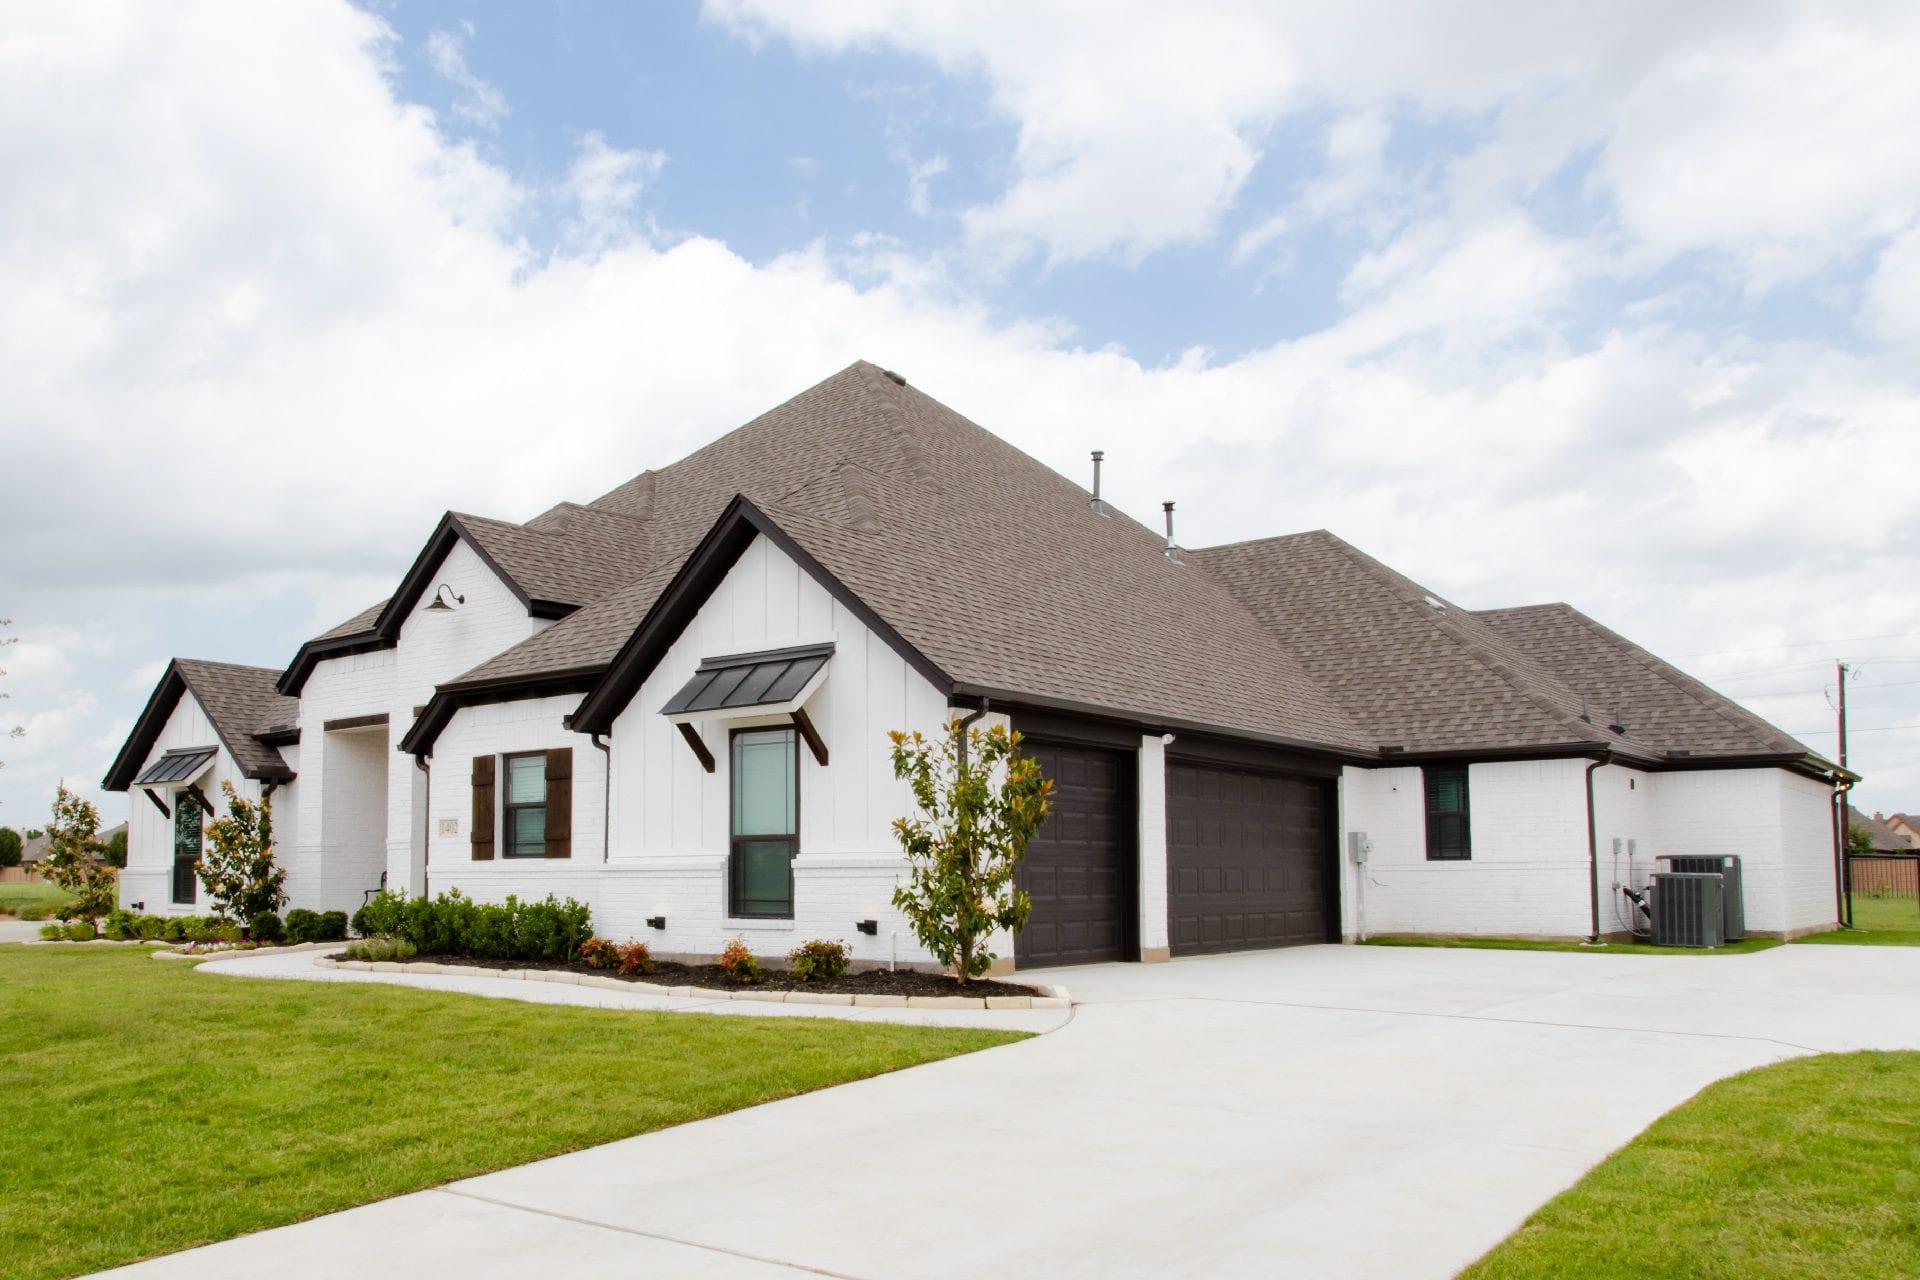 brookson-builder-legacy-ranch-model-home-01